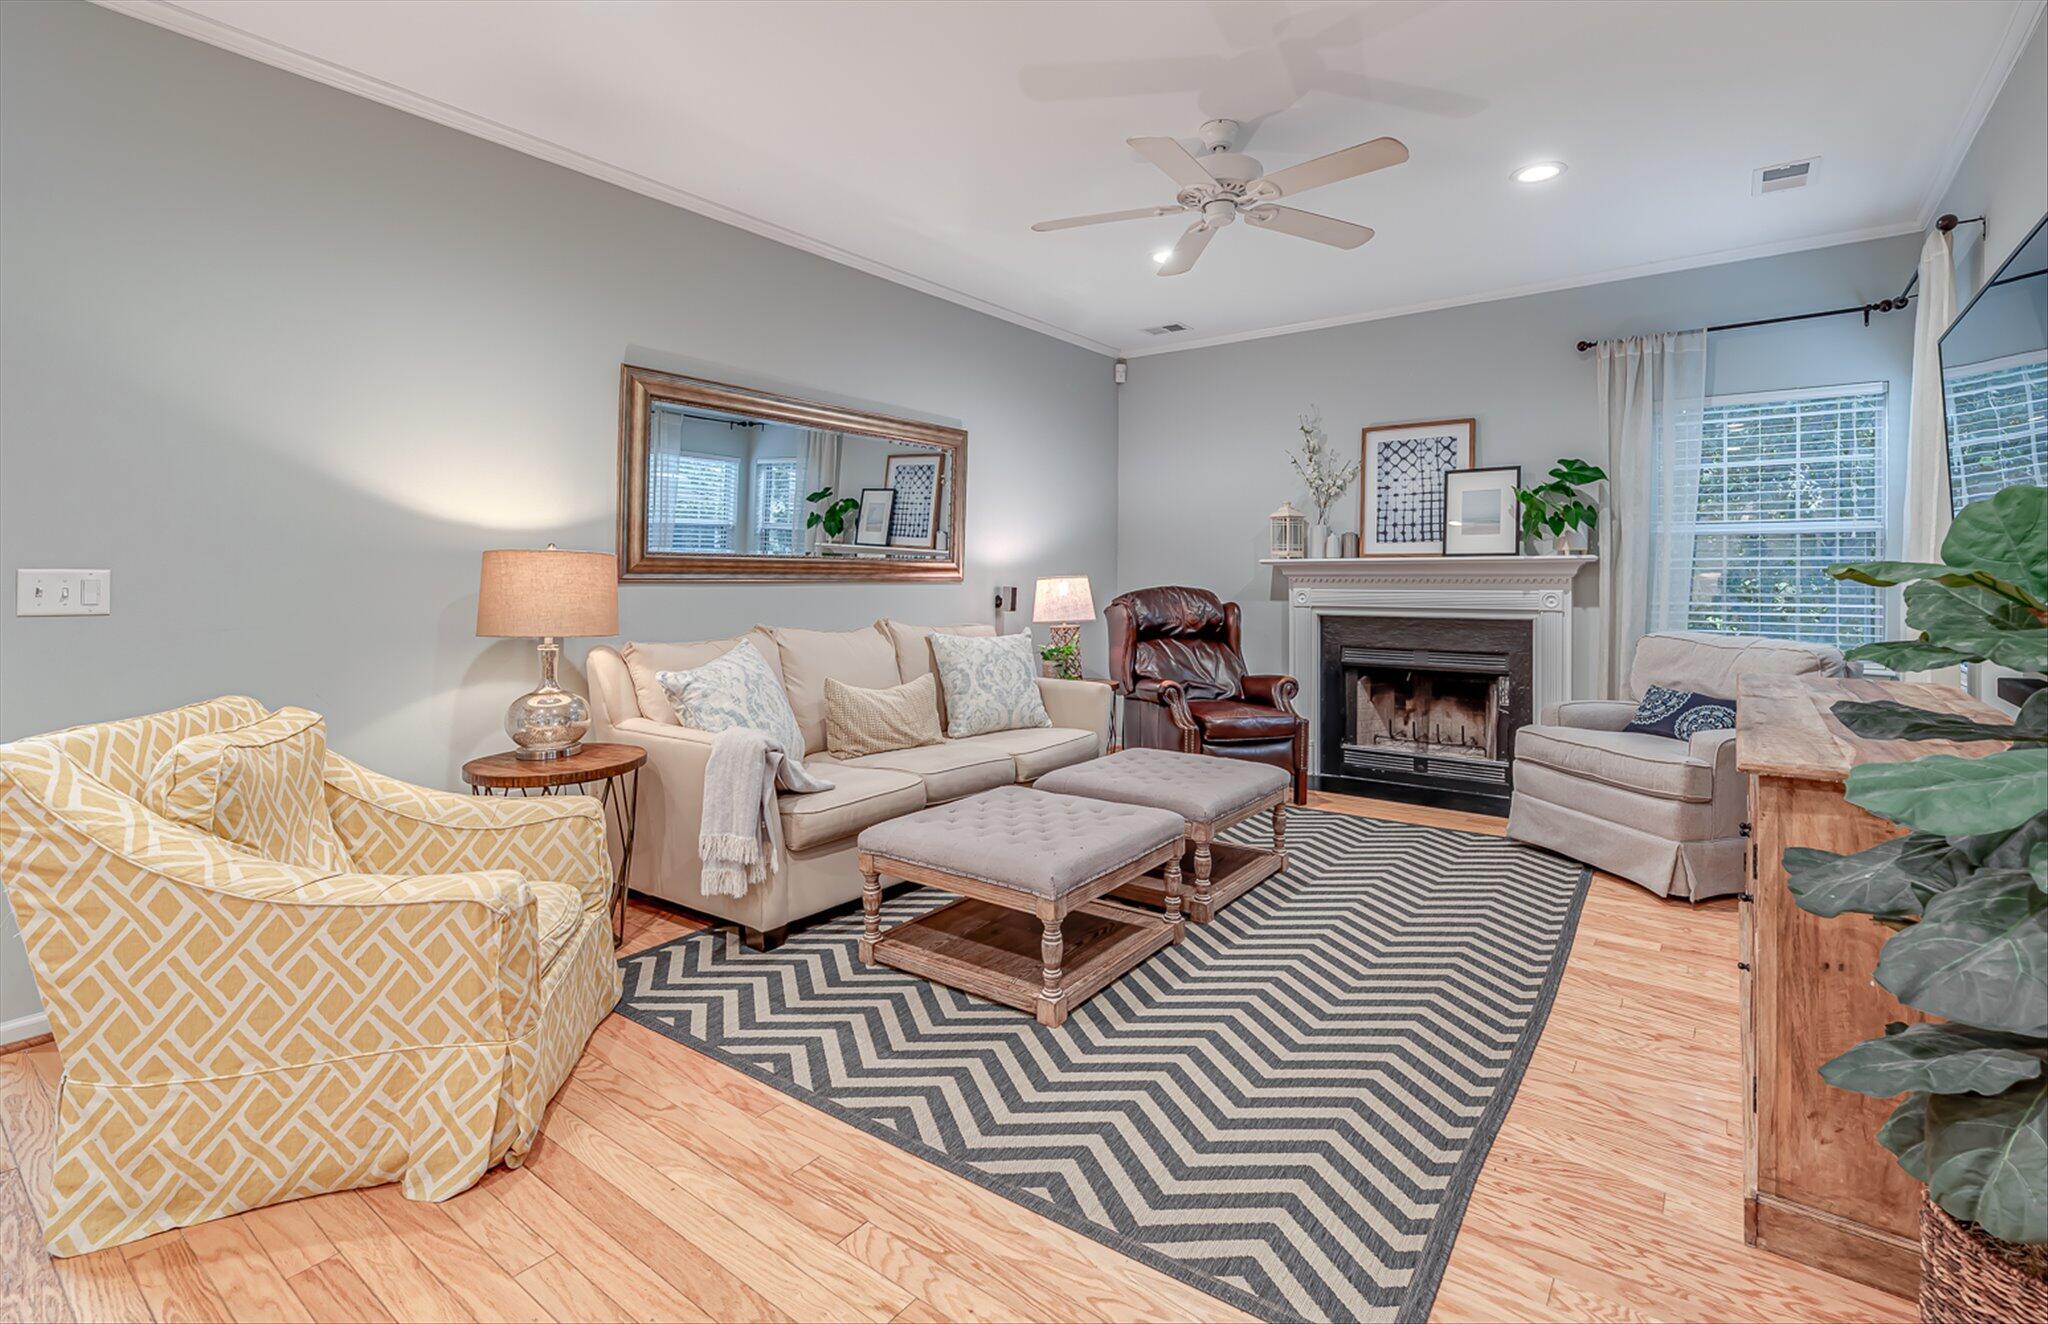 Belle Hall Homes For Sale - 278 Jardinere, Mount Pleasant, SC - 11